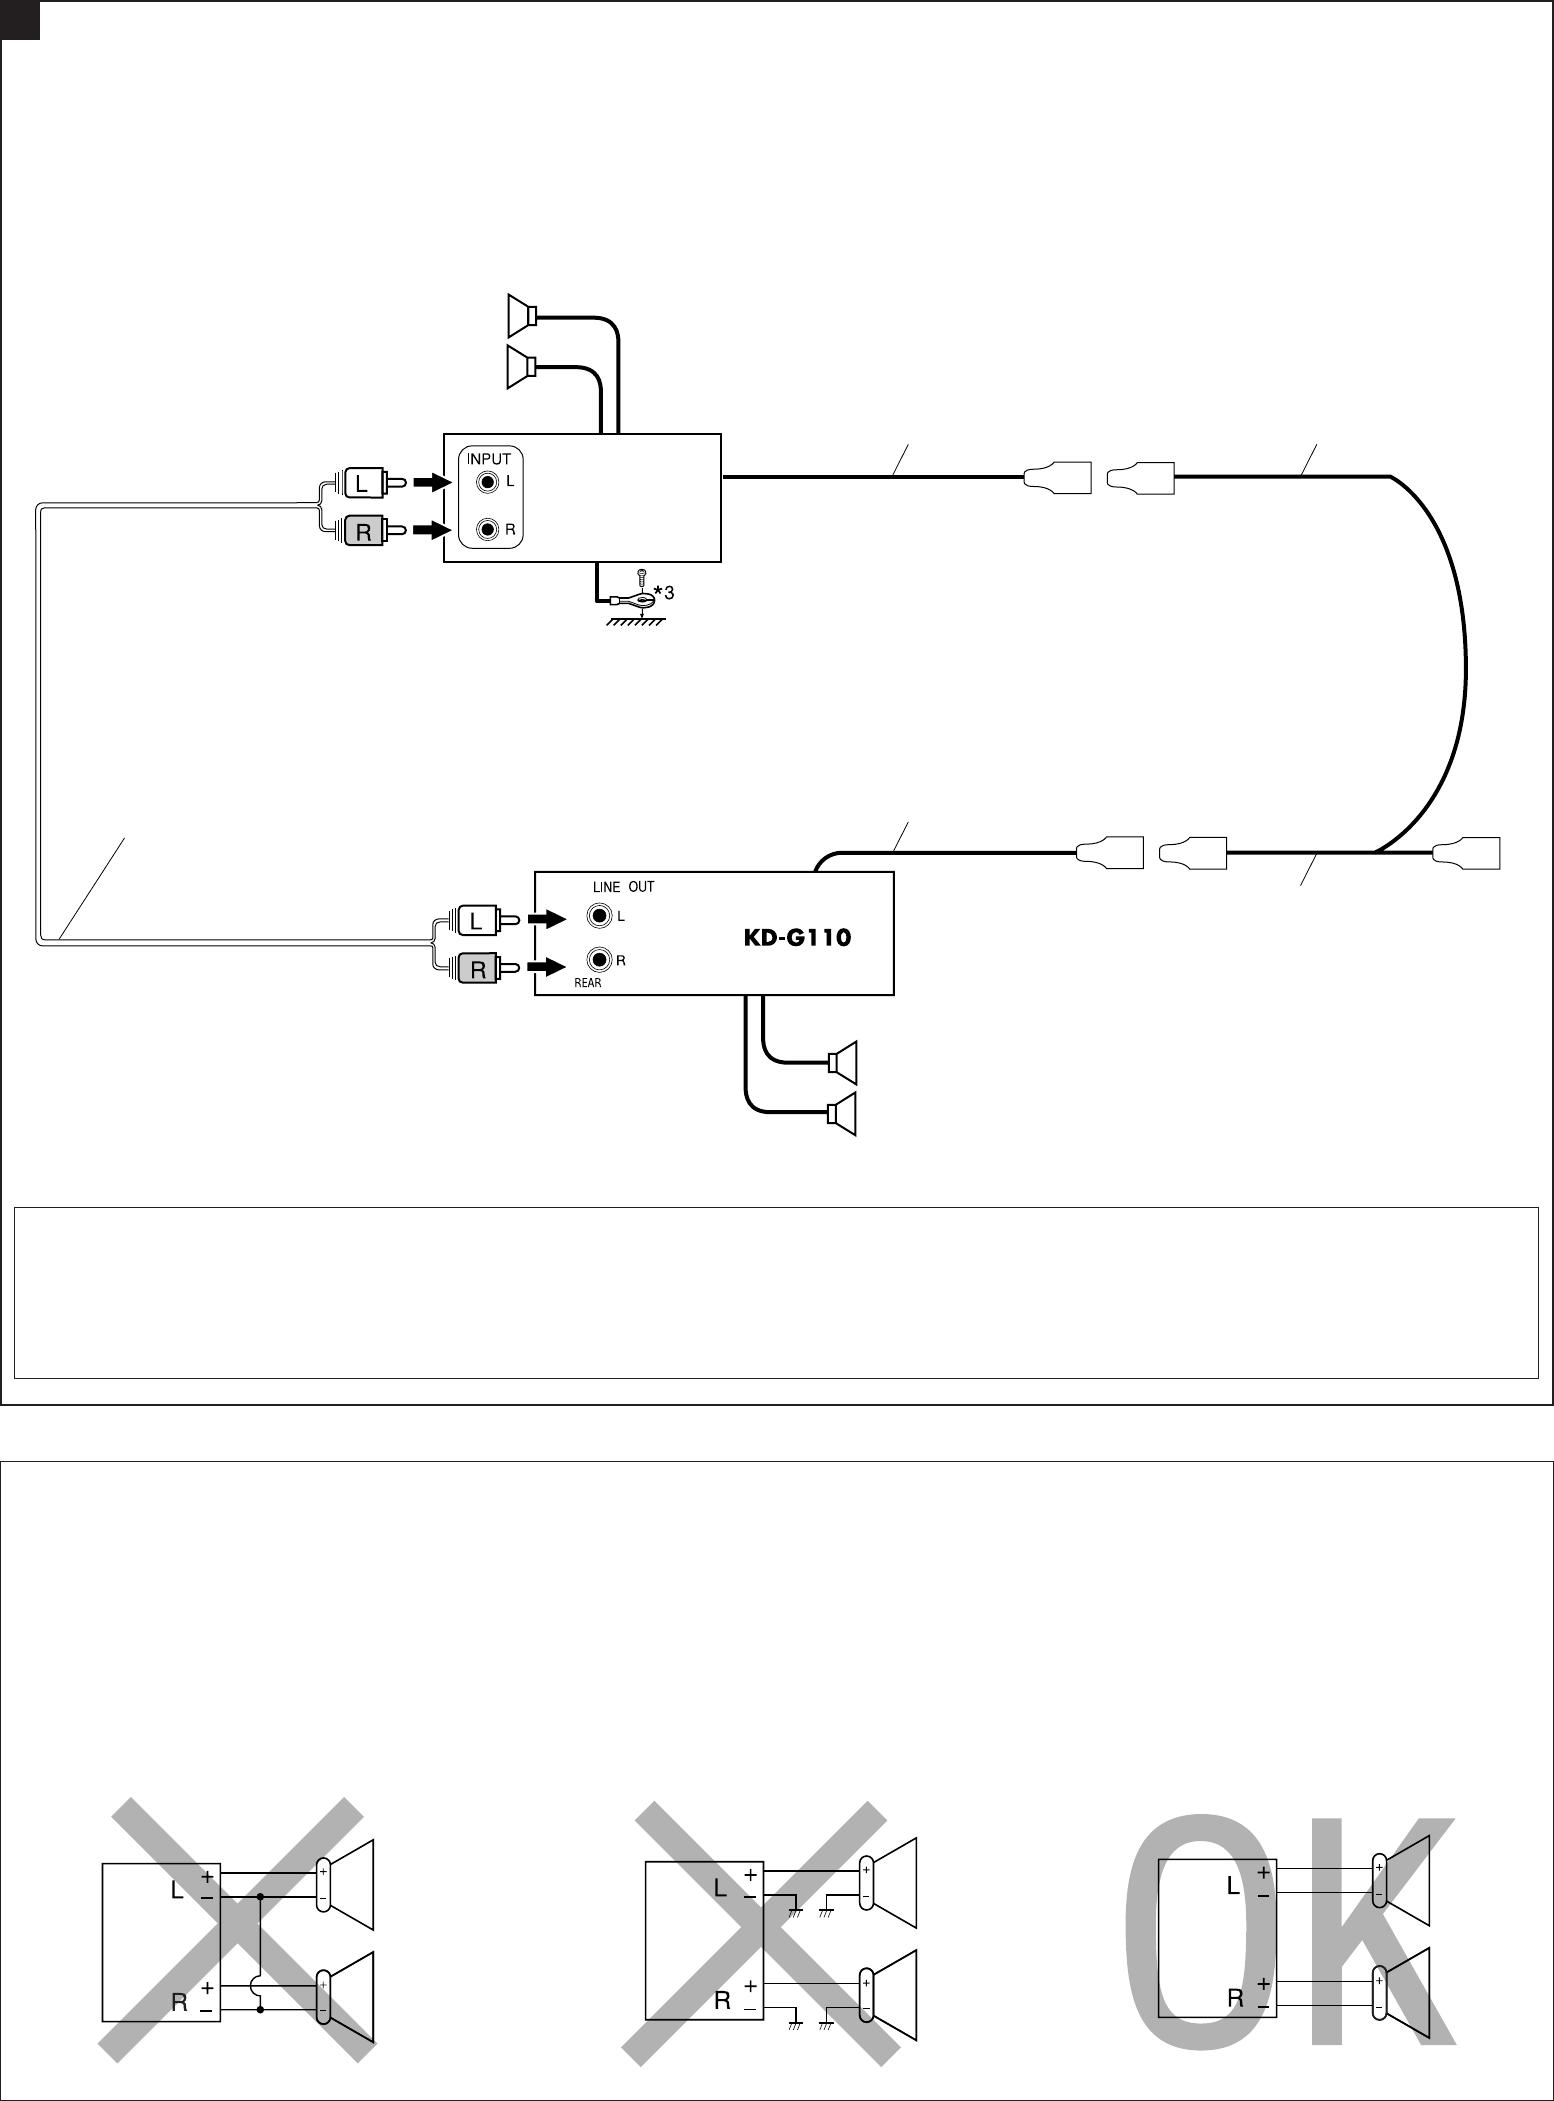 jvc kd g110 wiring diagram jvc kd g110 installation manual instal1 2 kd g110 j f  jvc kd g110 installation manual instal1